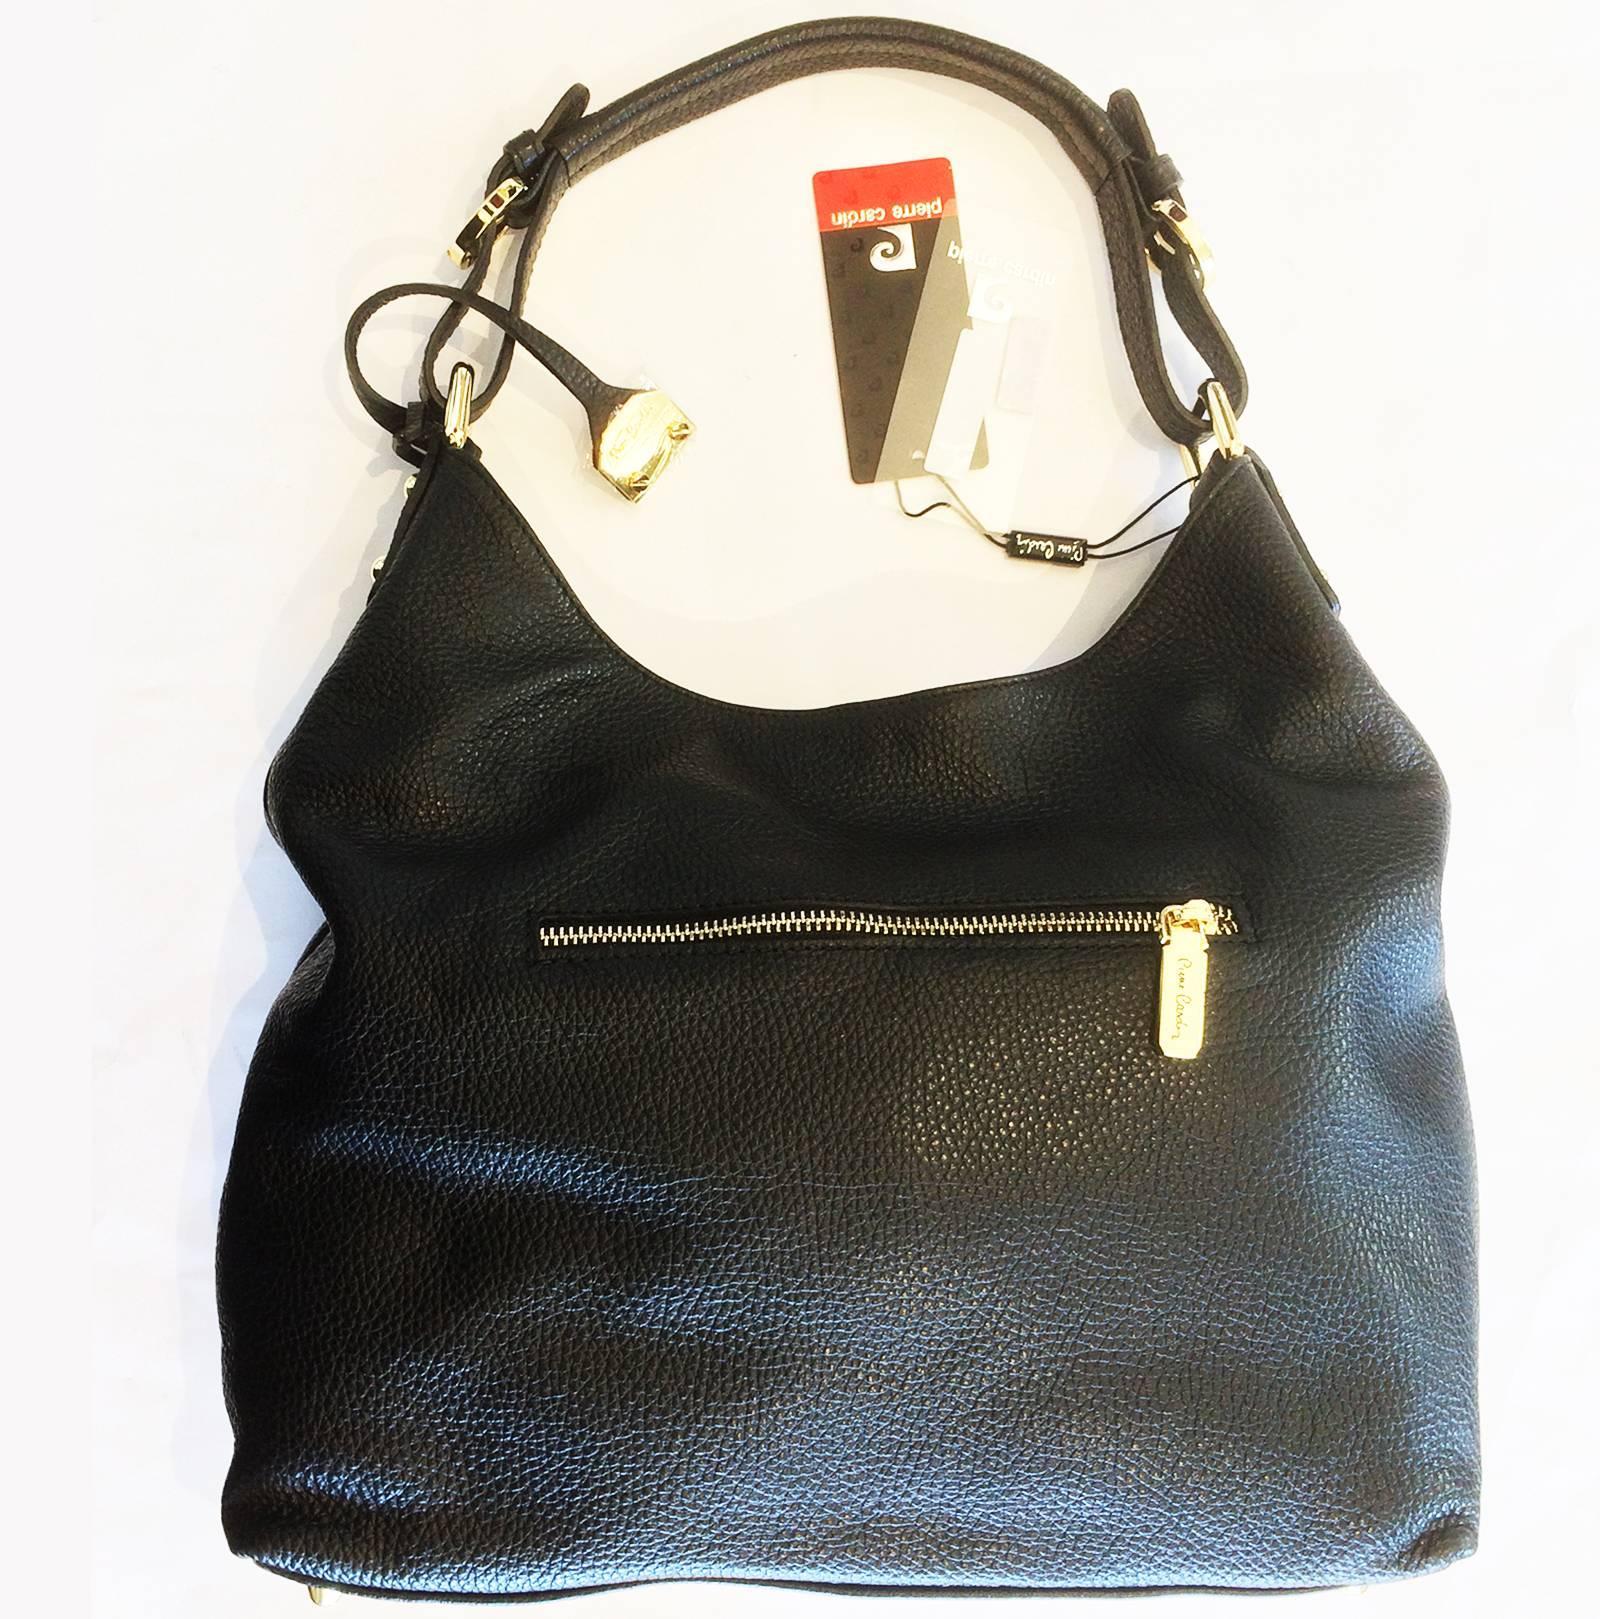 9c25944f9d Pierre Cardin New black leather hobo bag handbag at 1stdibs